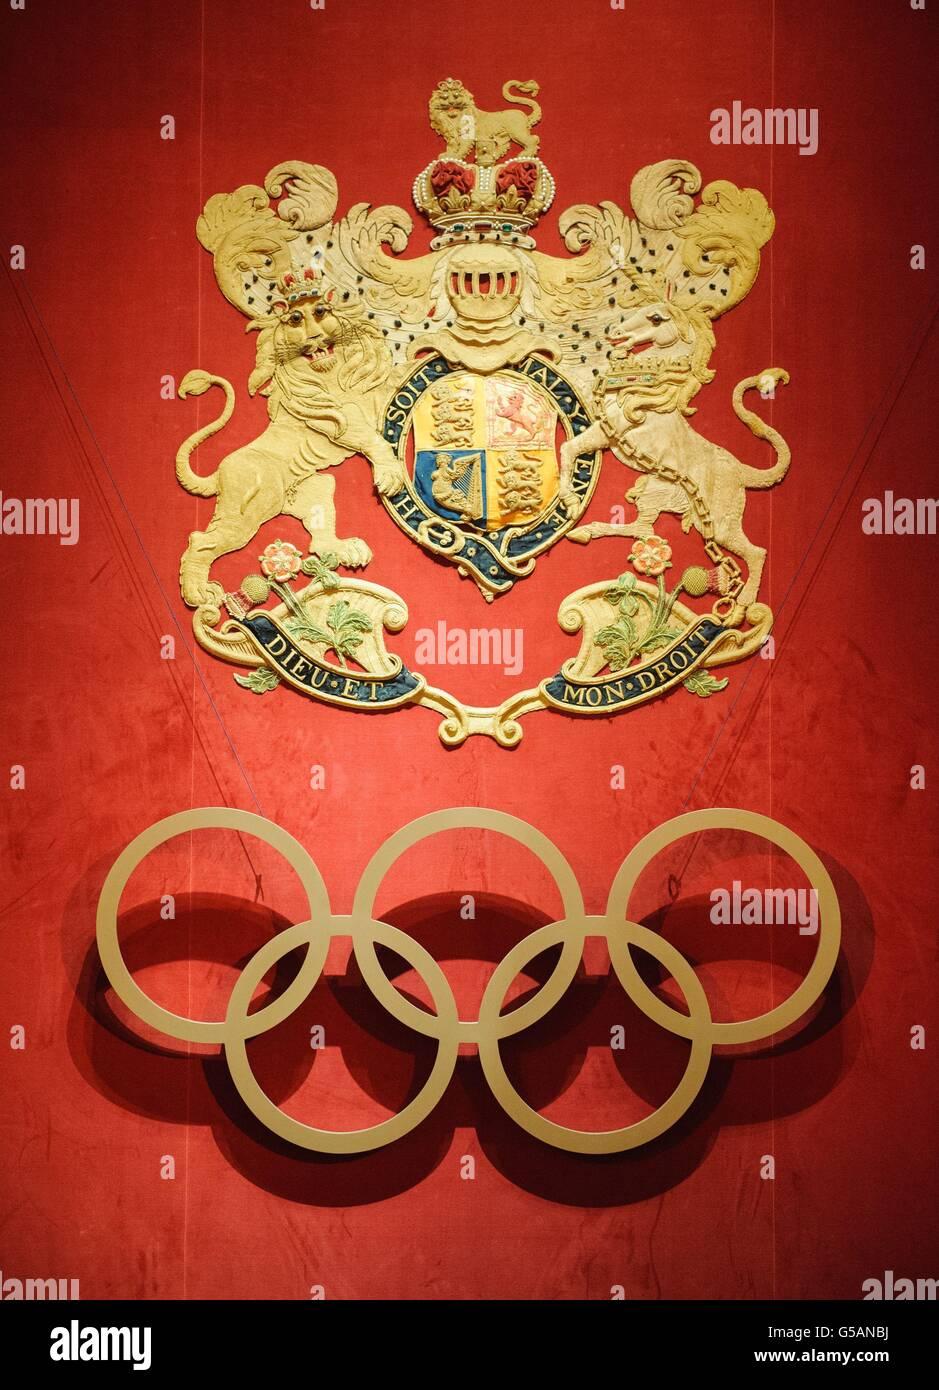 Internationales Olympisches Komitee-Rezeption Stockfoto